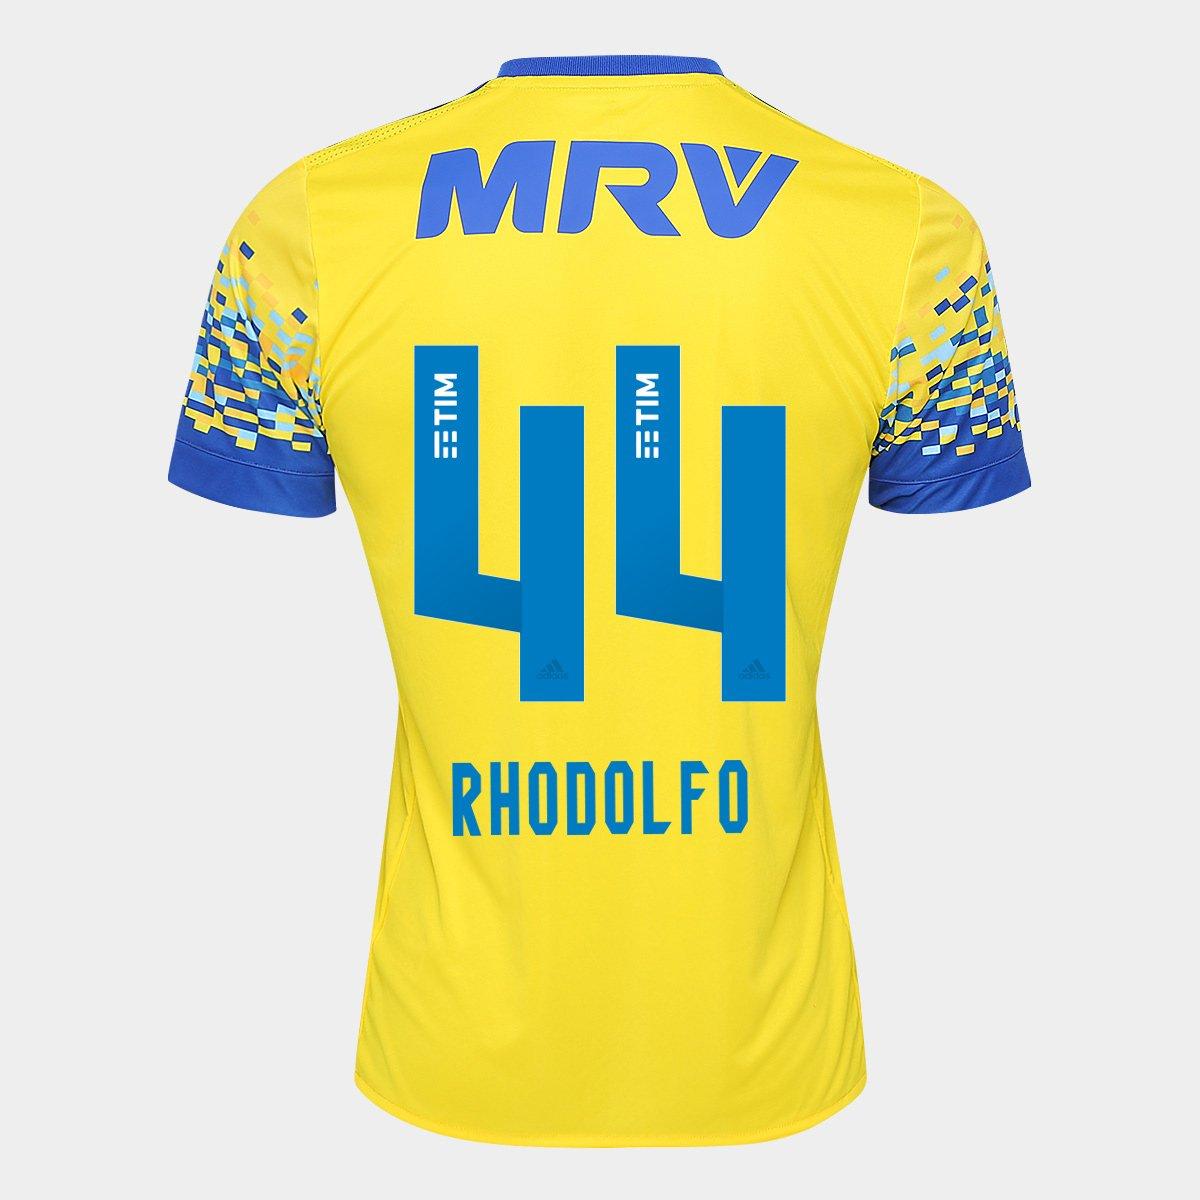 4220c84e23 Camisa Flamengo III 17 18 N° 44 - Rhodolfo Torcedor Adidas Masculina -  Compre Agora